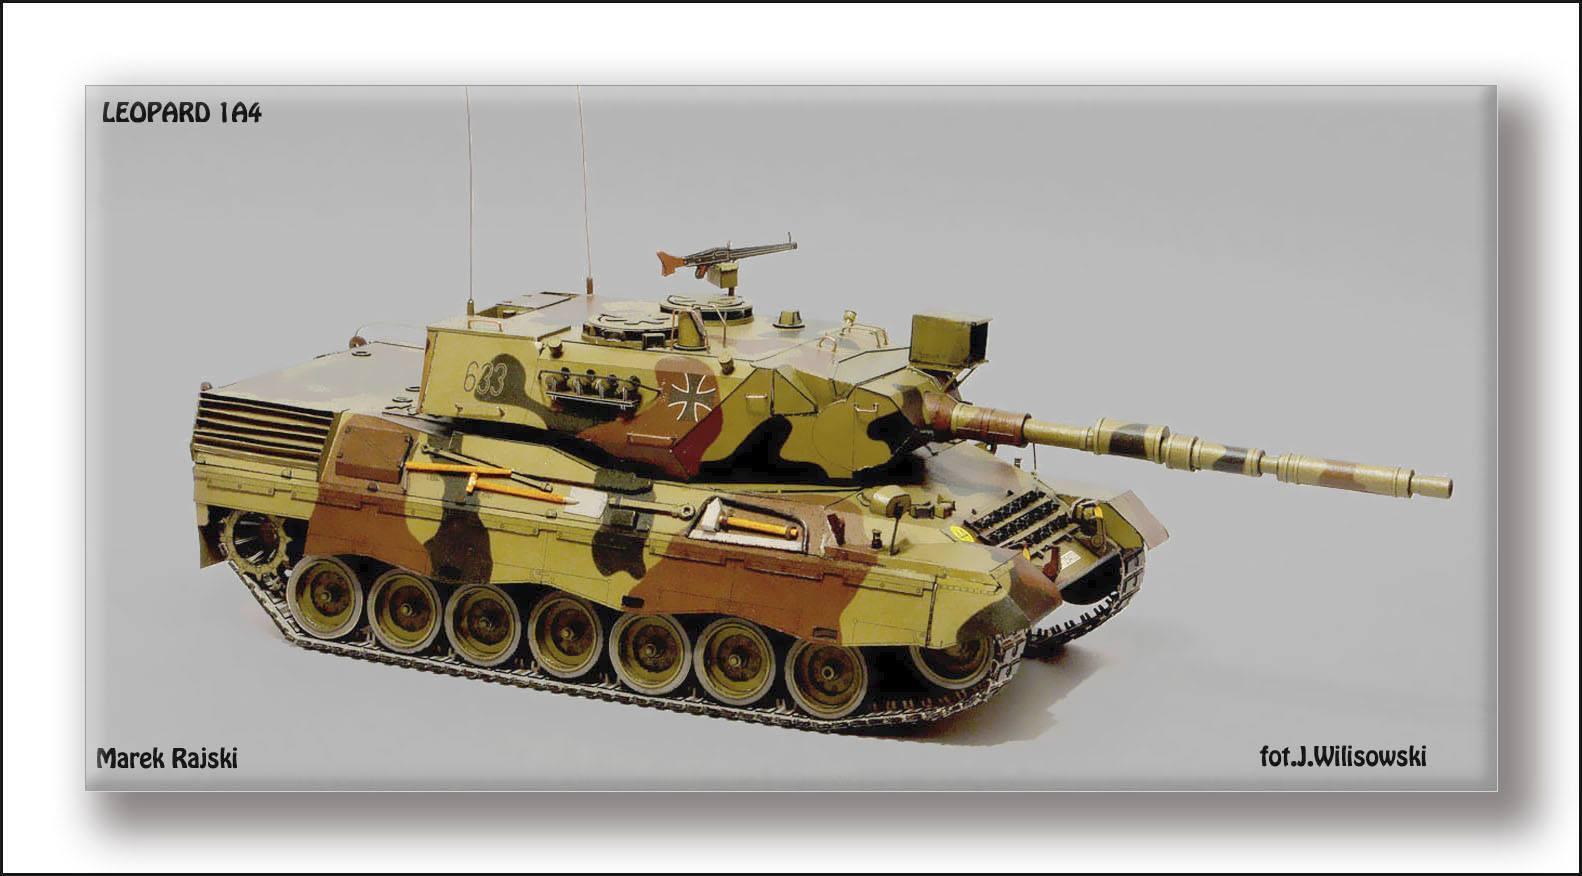 Modelik 12 11 - Solid Leopard 1A4 1 25 with Lasercut Parts